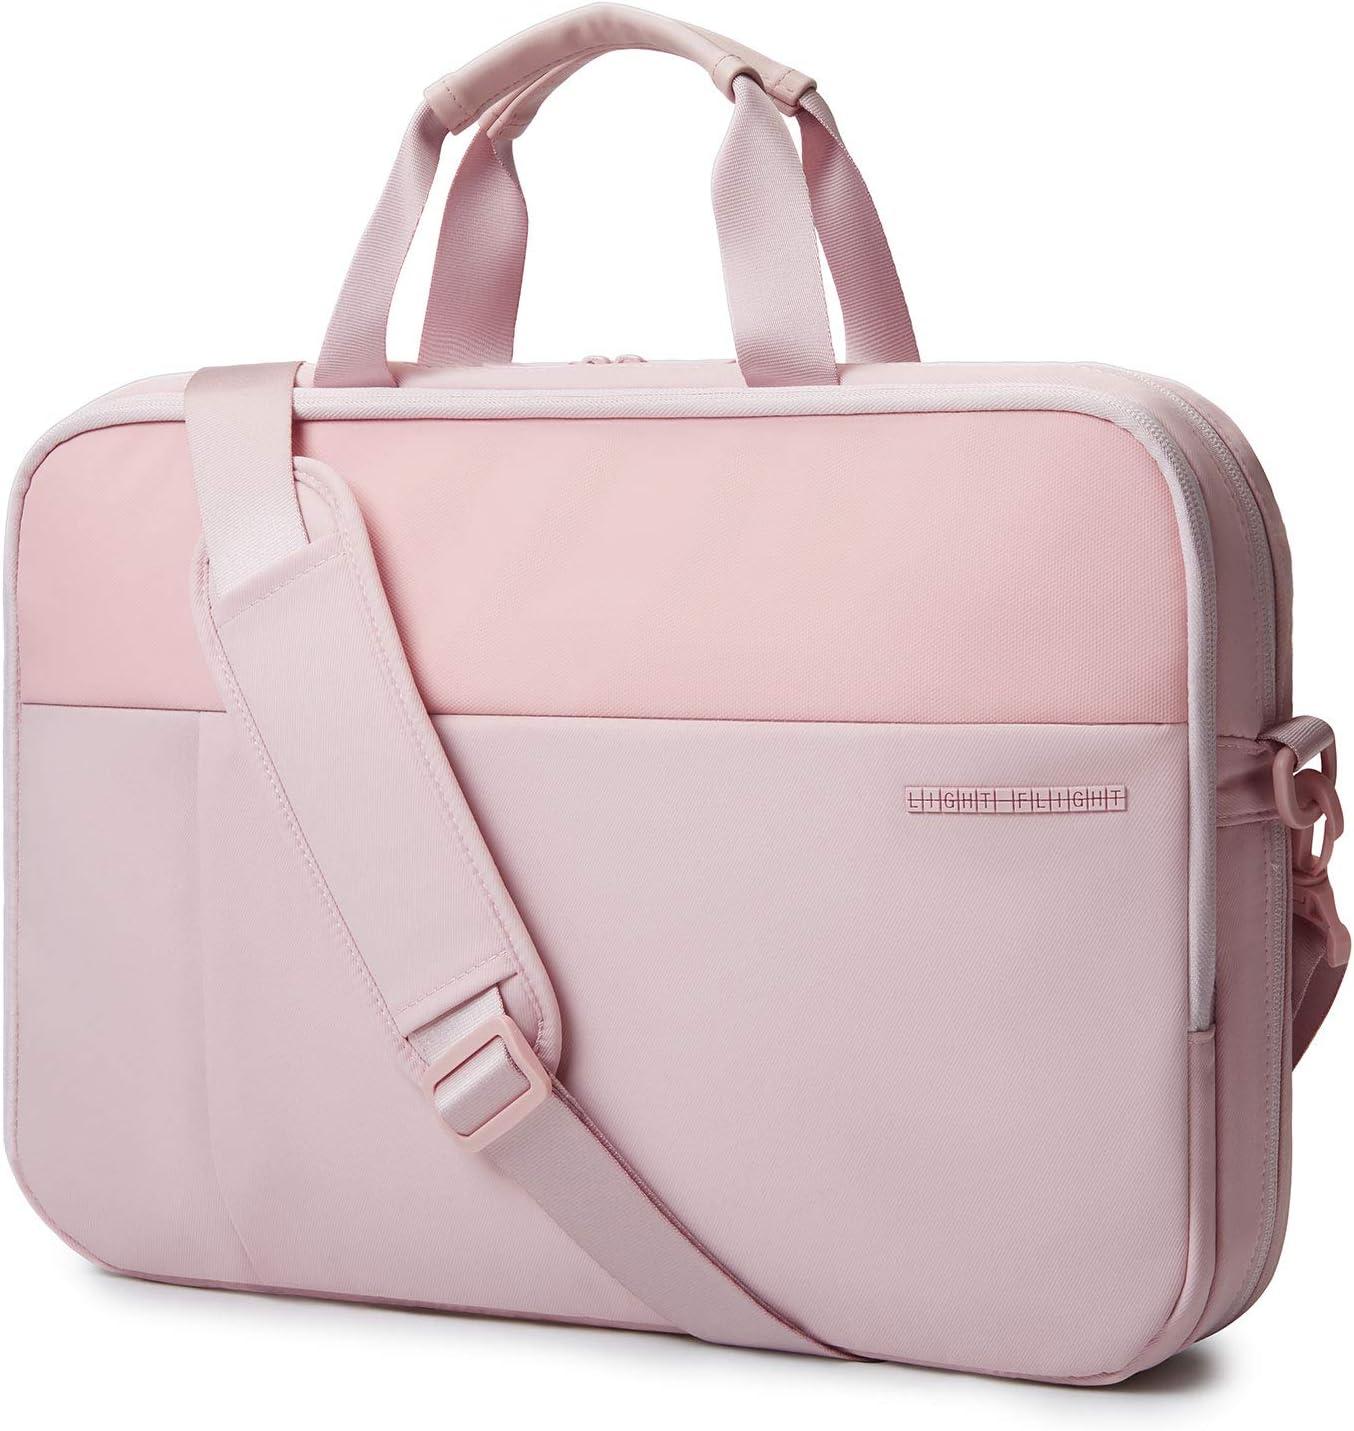 Laptop Bag,LIGHT FLIGHT 15.6 Inch Expandable Briefcase for Men Women,Slim Laptop Bag for Computer,Water Resistant Business Bag,Pink